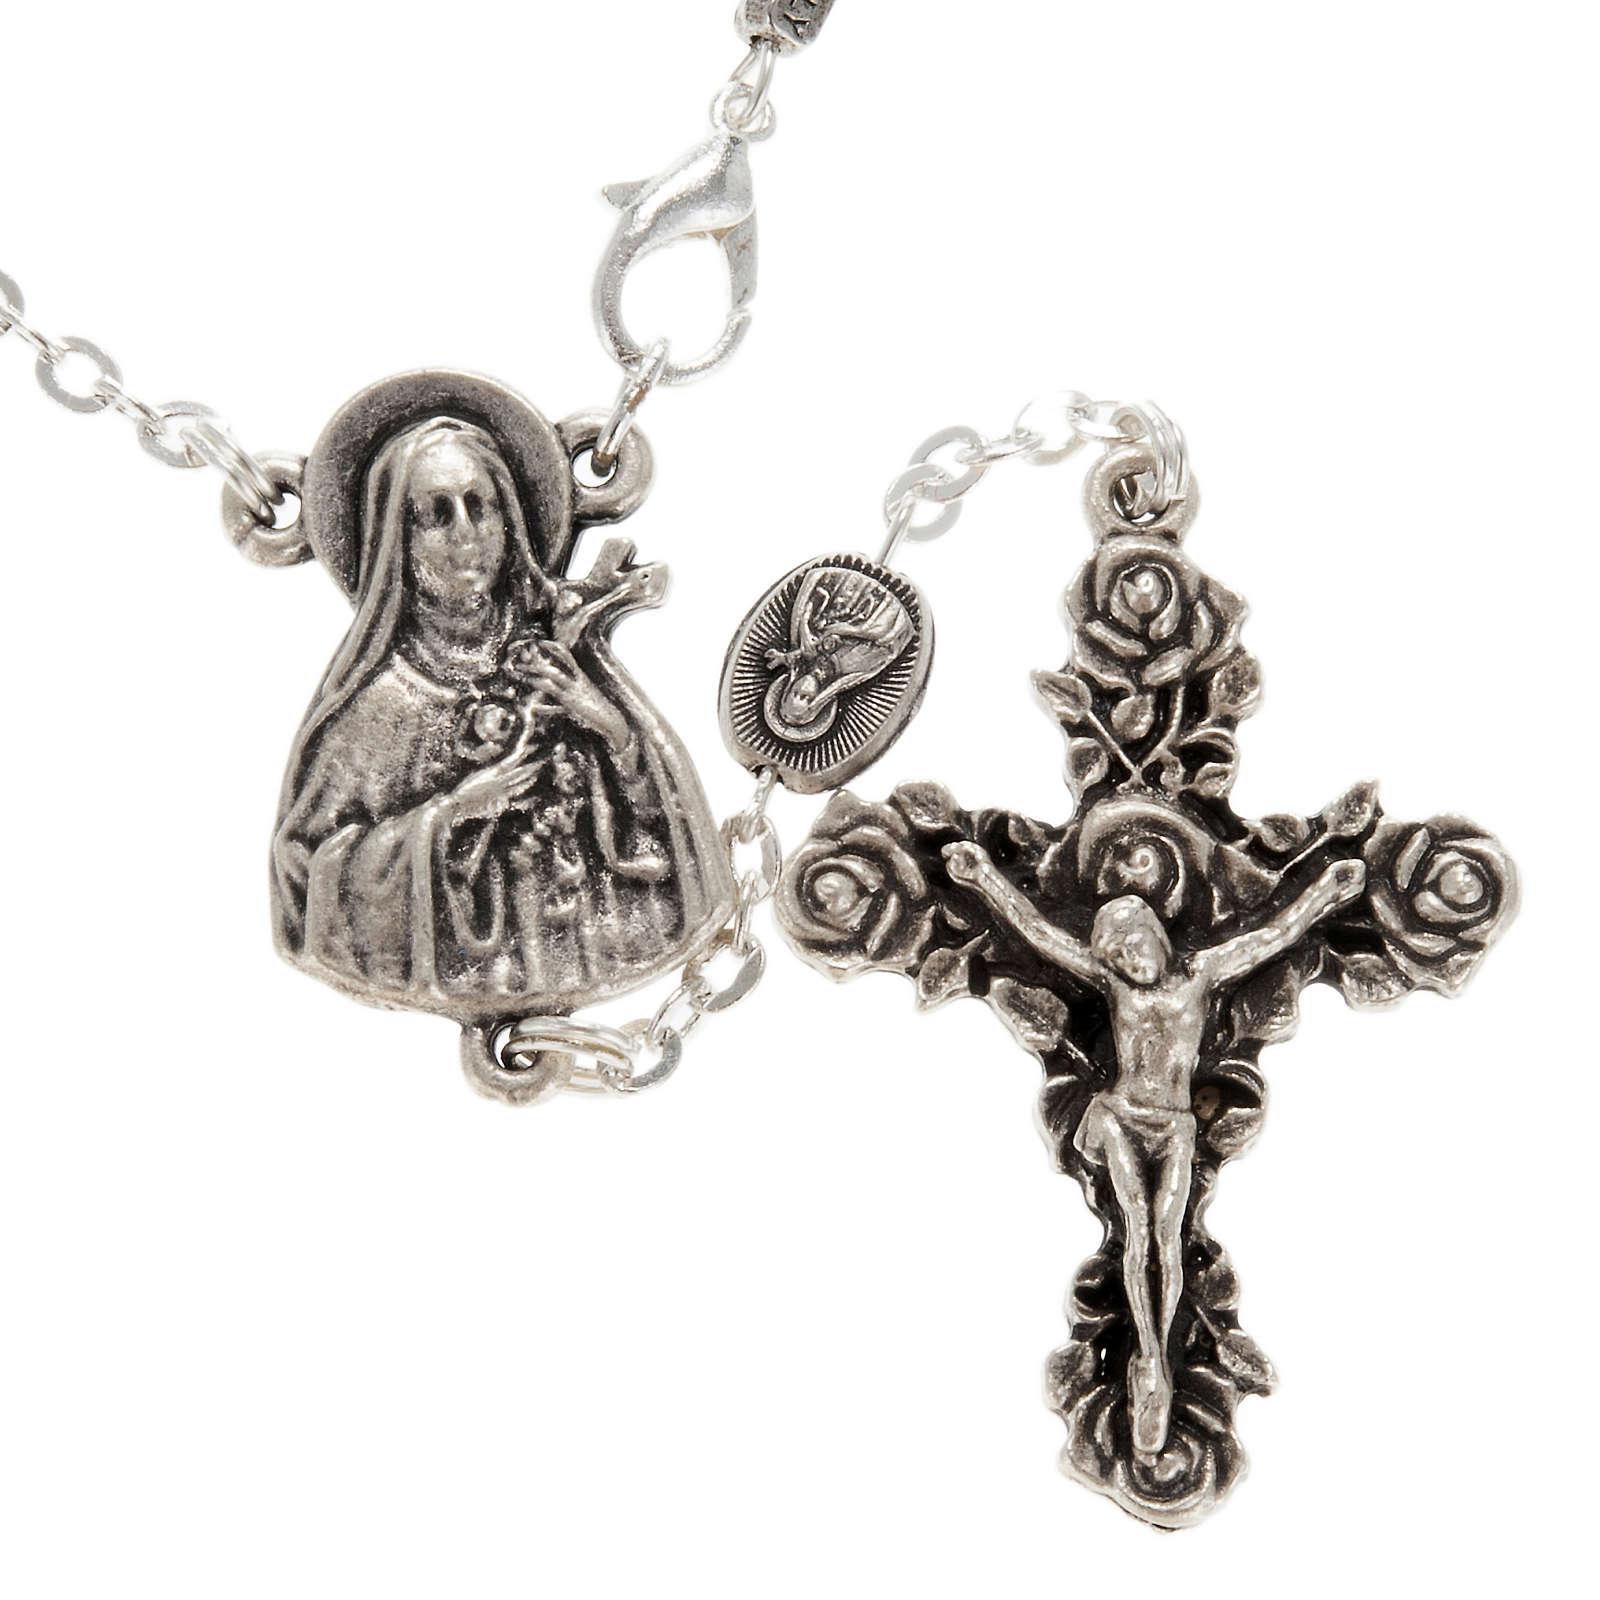 Ghirelli single-decade rosary, Saint Teresa in brass, 6x8mm 4